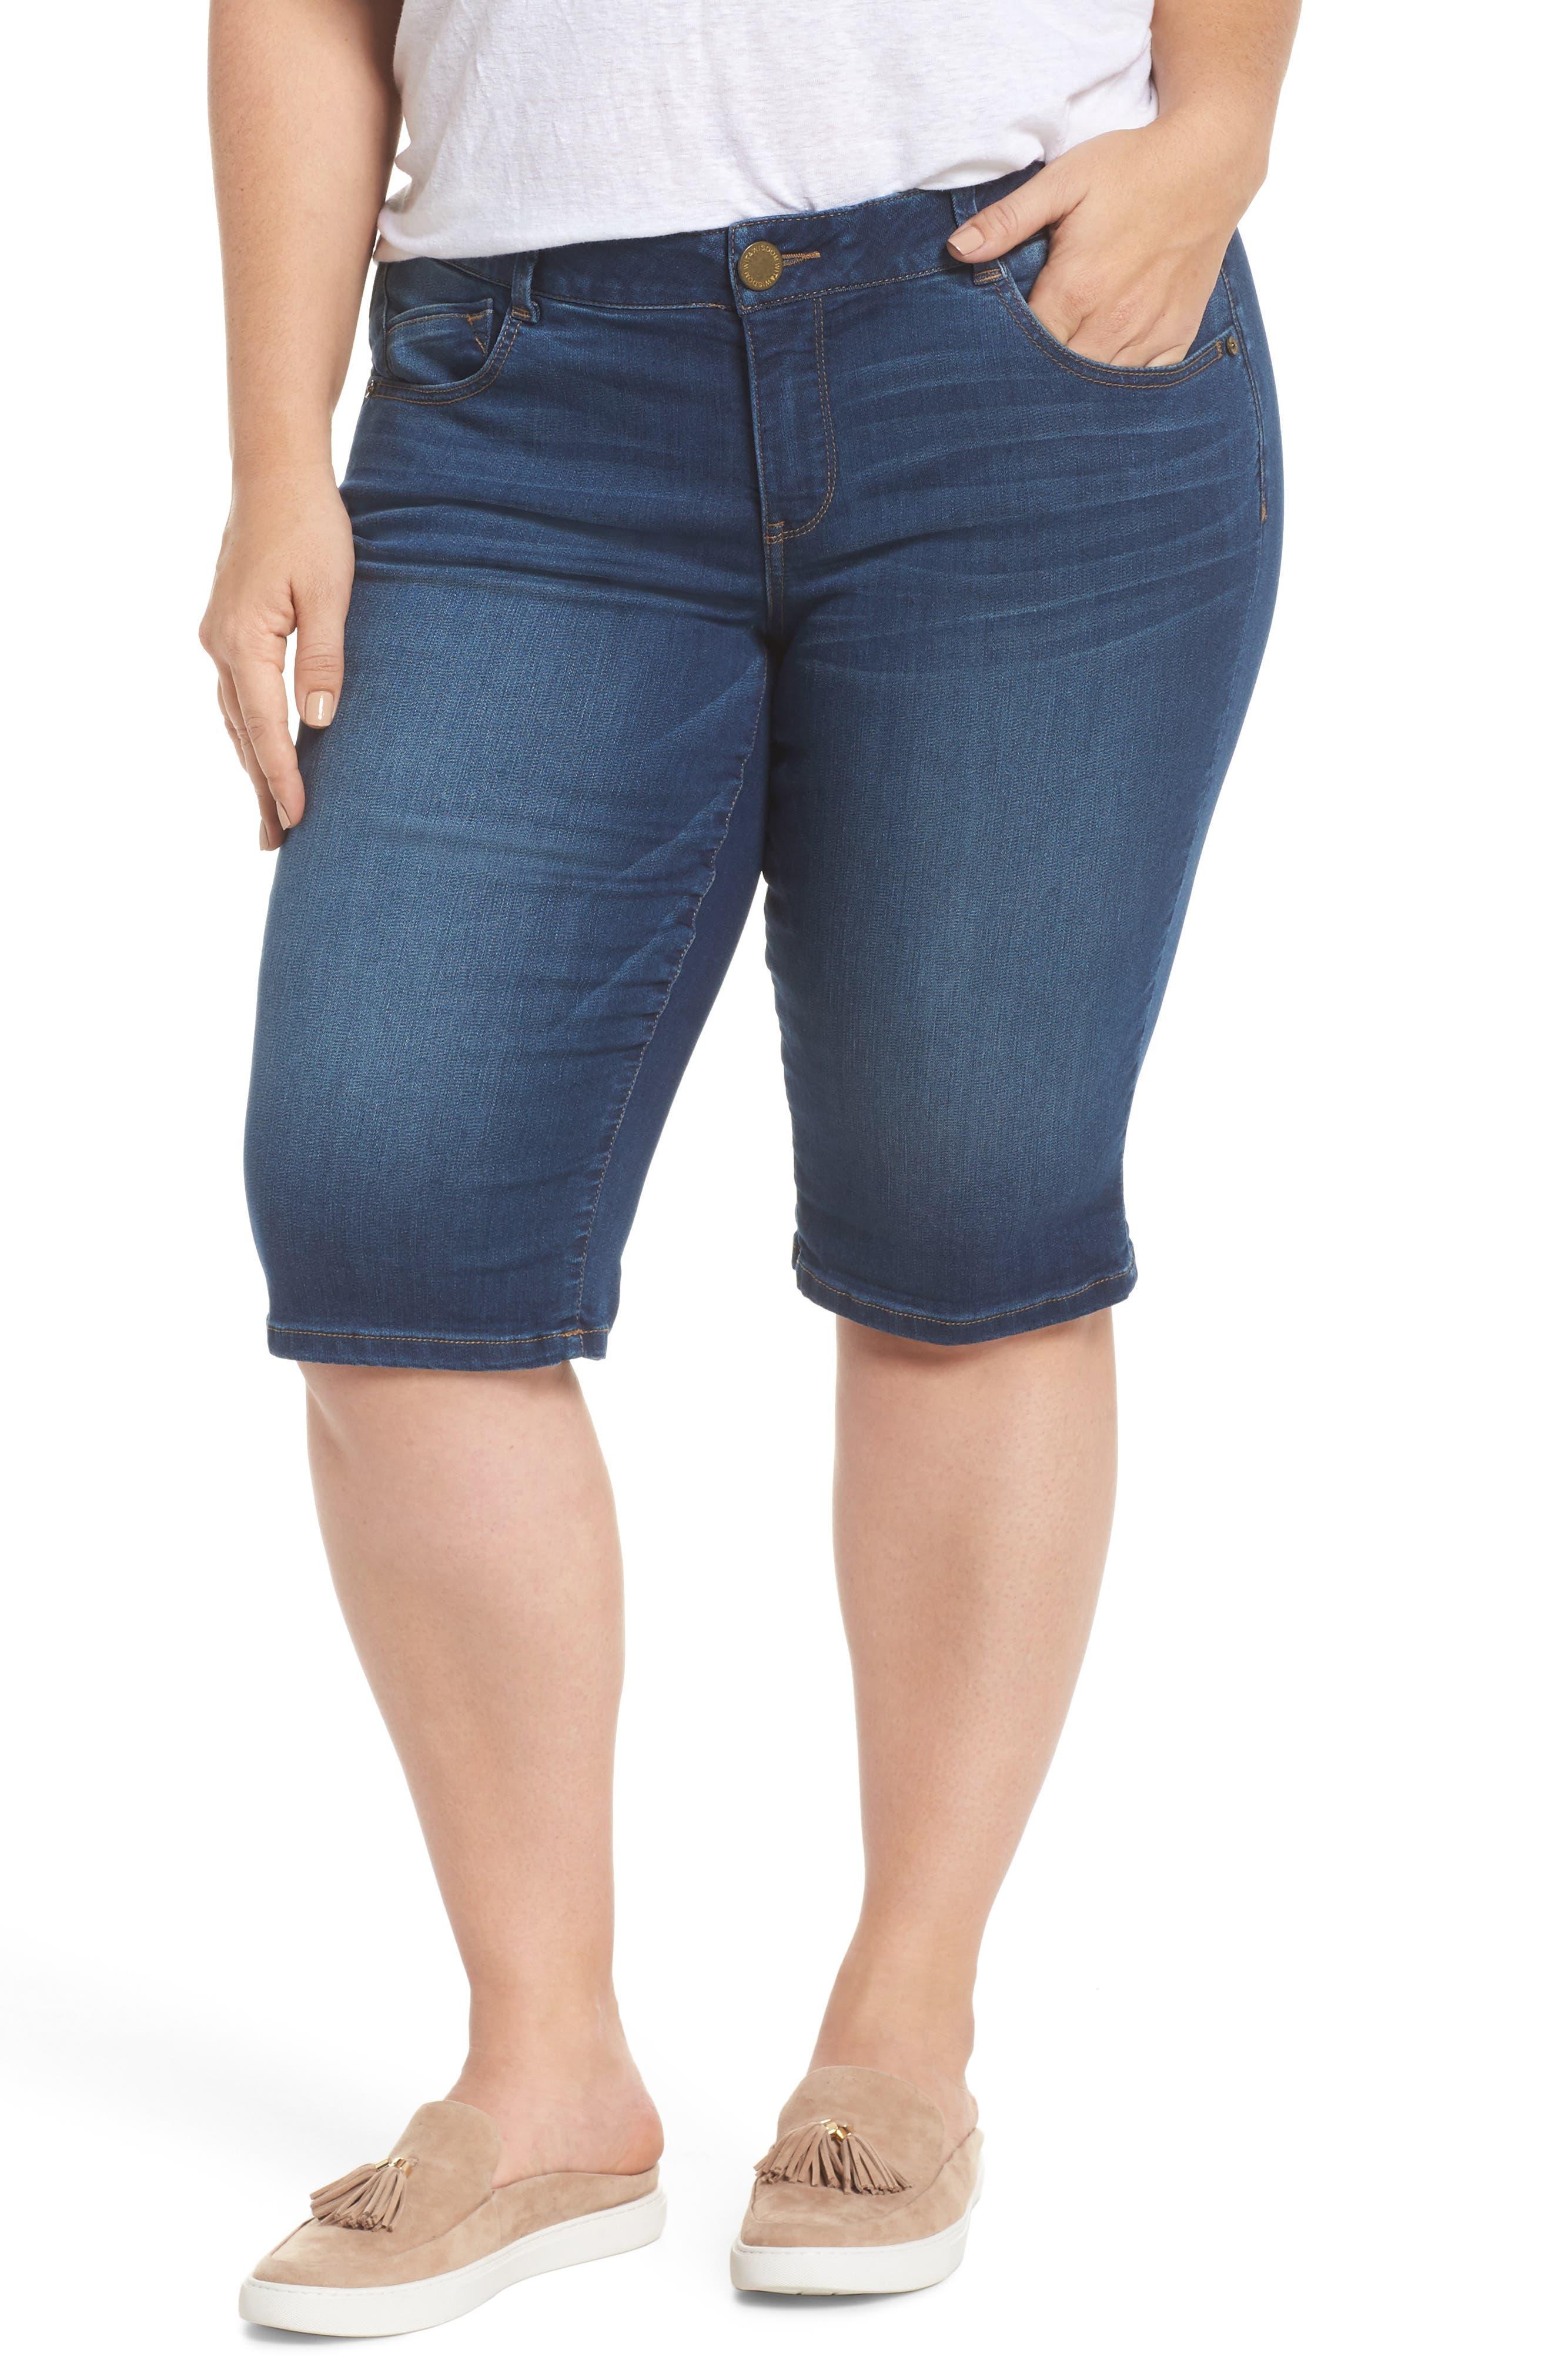 Ab-solution Denim Bermuda Shorts,                         Main,                         color, Blue